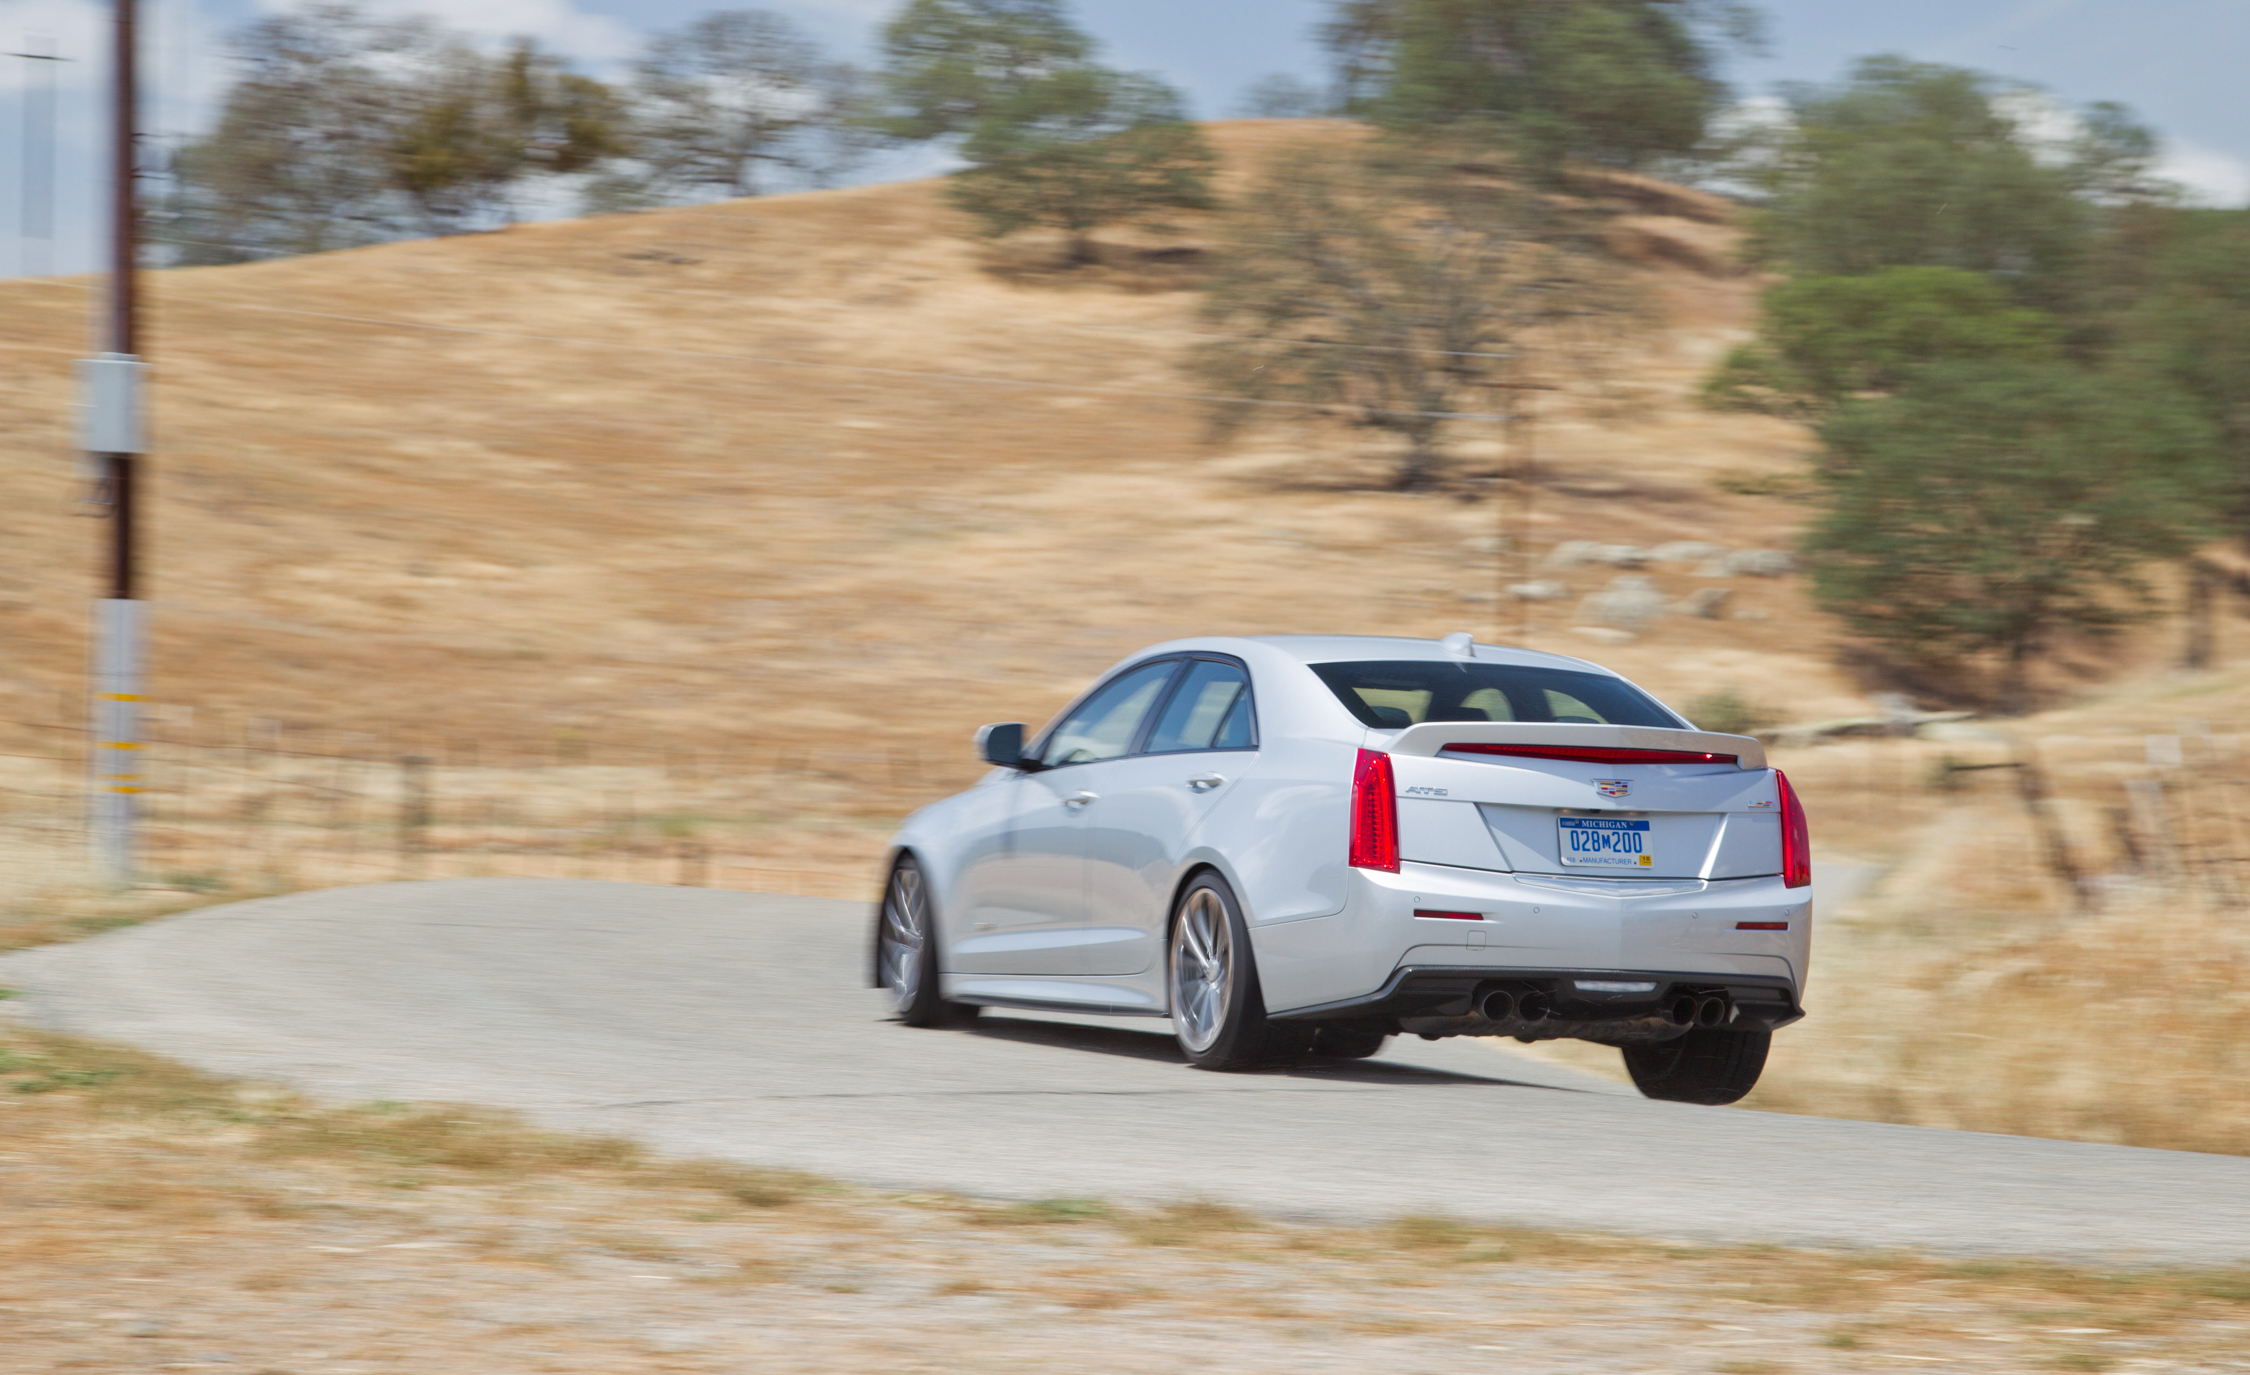 2016 Cadillac ATS-V Rear Side Design